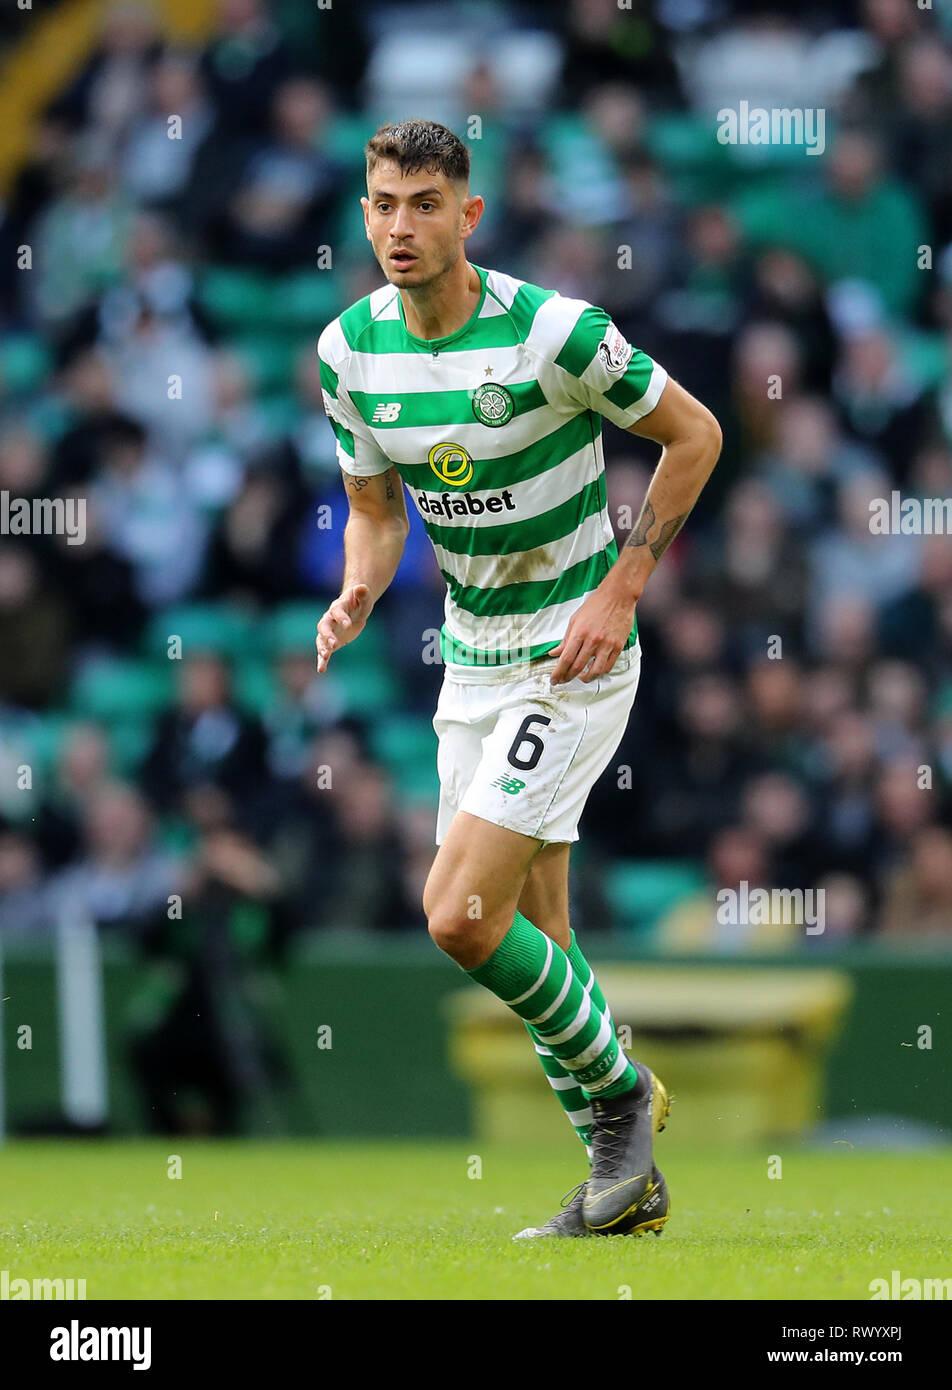 Celtic's Nir Bitton - Stock Image